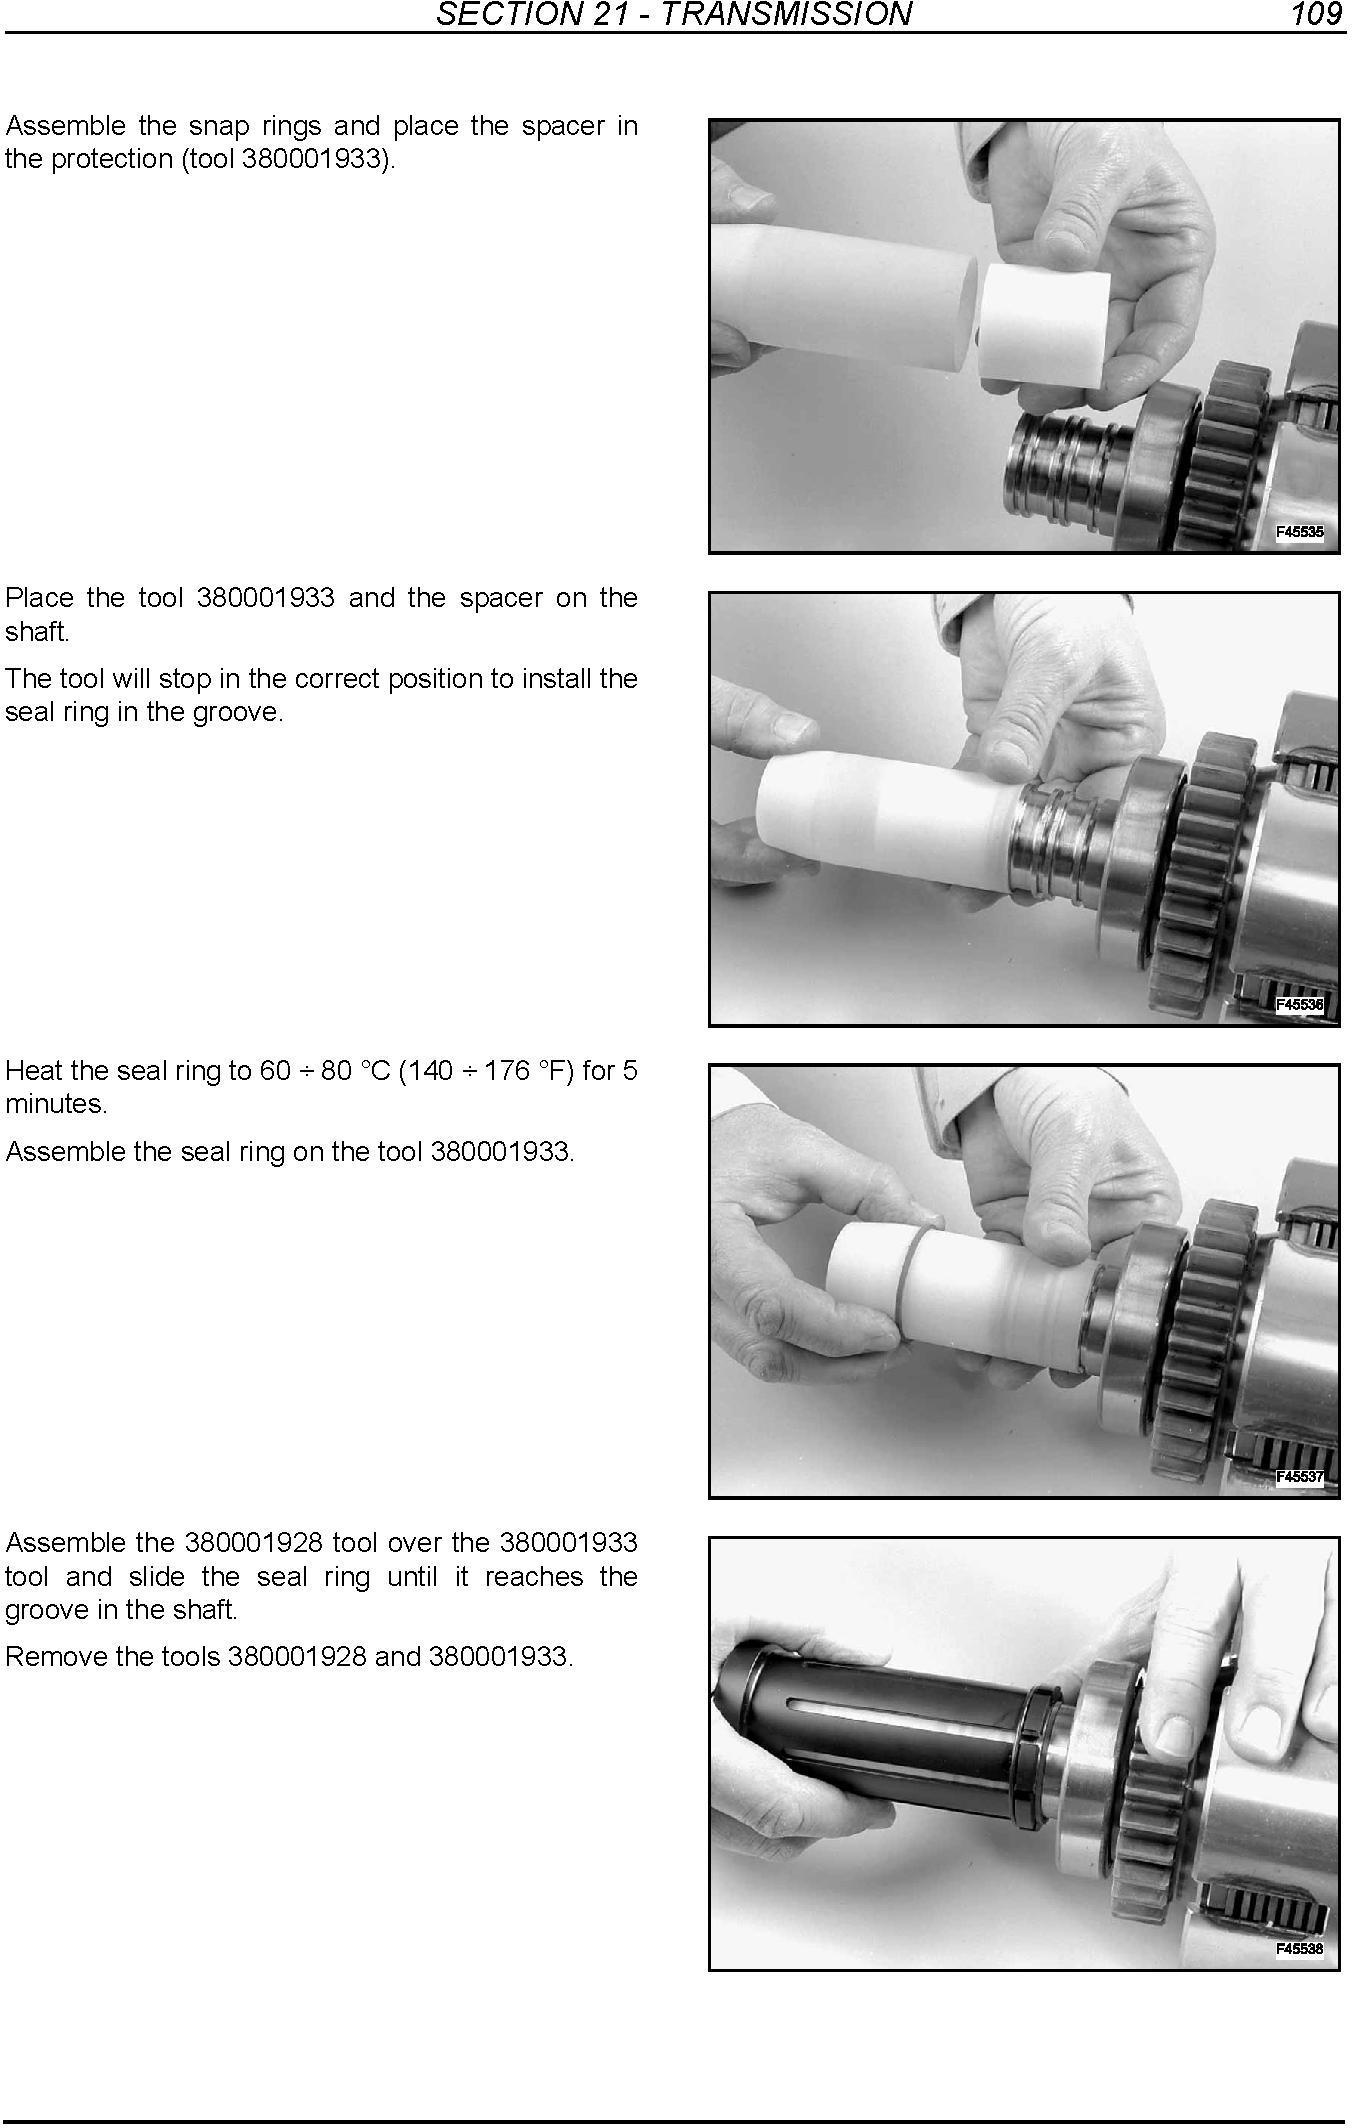 New Holland B90B /BLR, B100B /BLR, B100BTC, B110B /BTC, B115B Tier 3 Backhoe Loaders Service Manual - 2